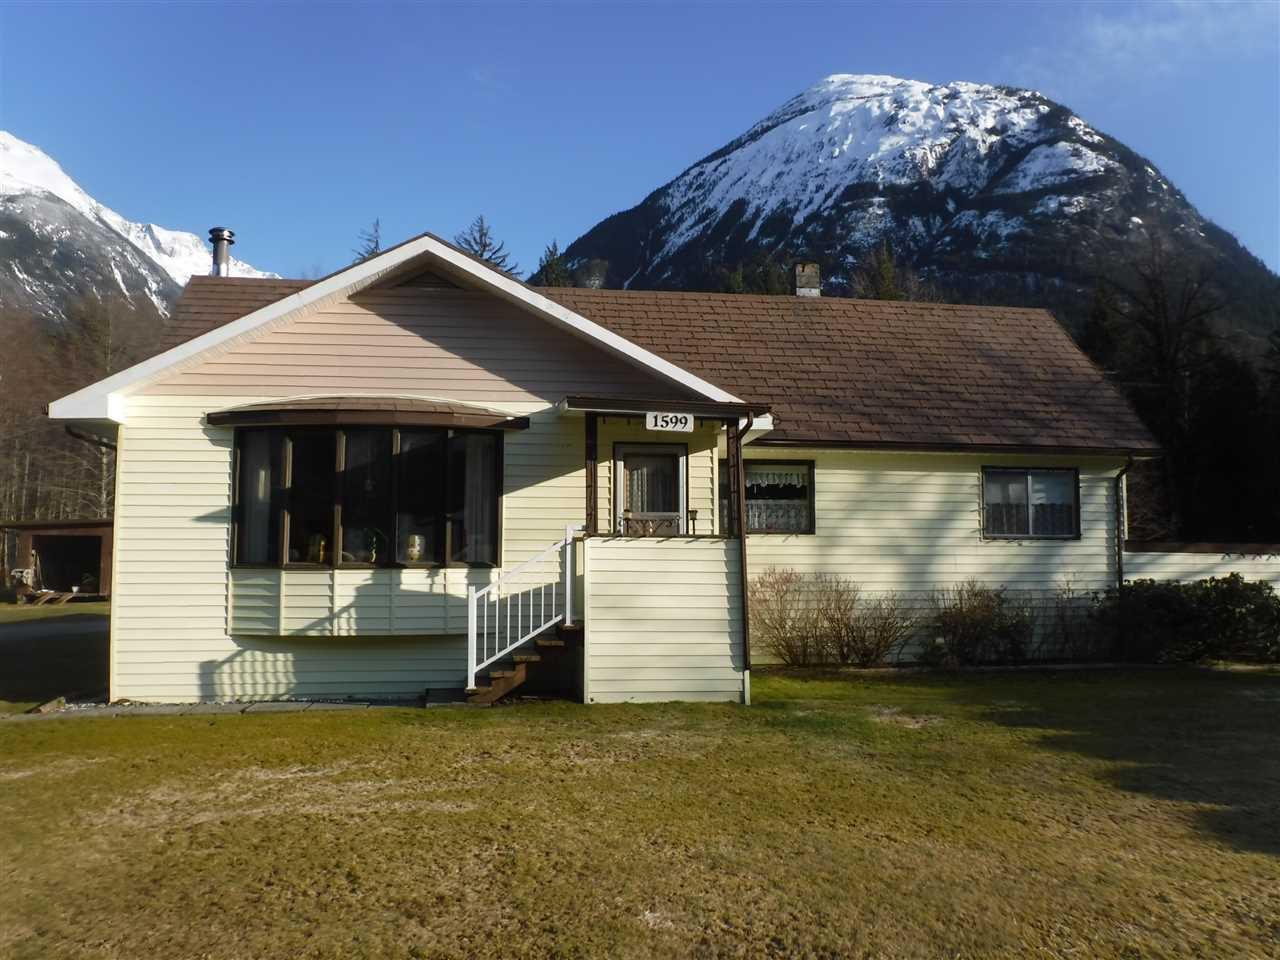 Main Photo: 1599 MACKENZIE Highway in Bella Coola: Bella Coola/Hagensborg House for sale (Williams Lake (Zone 27))  : MLS®# R2449026